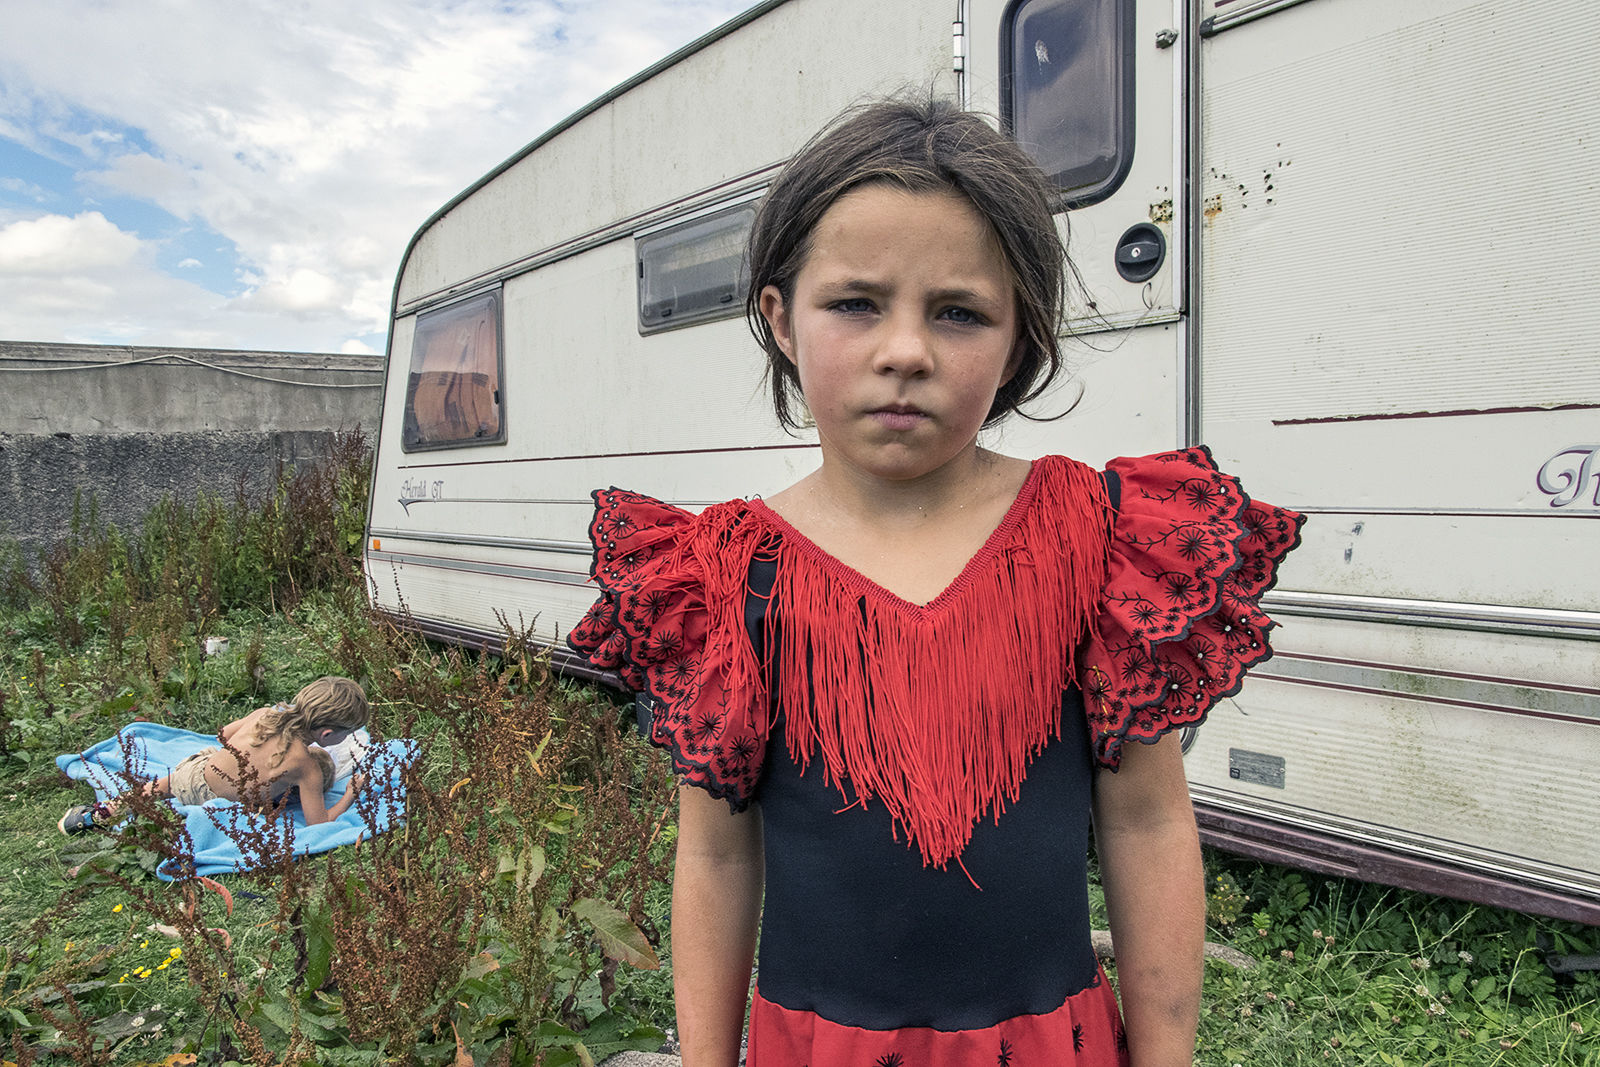 Nikita in Red Gypsy Dress, roadside campsite, Tipperary, Ireland 2018